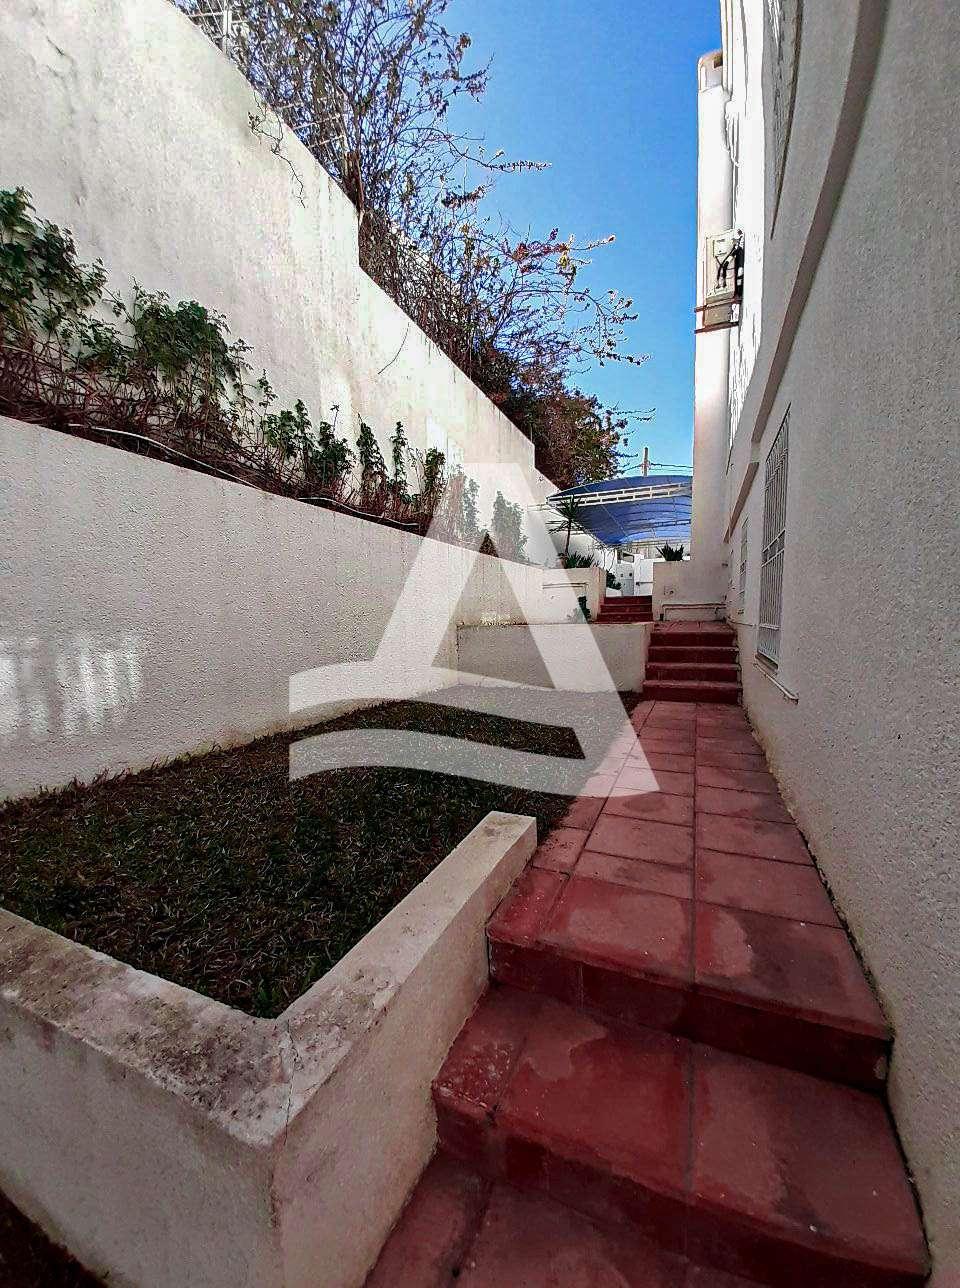 httpss3.amazonaws.comlogimoaws11586885281617896959Appartement_Marsa_Tunisie_-3-1